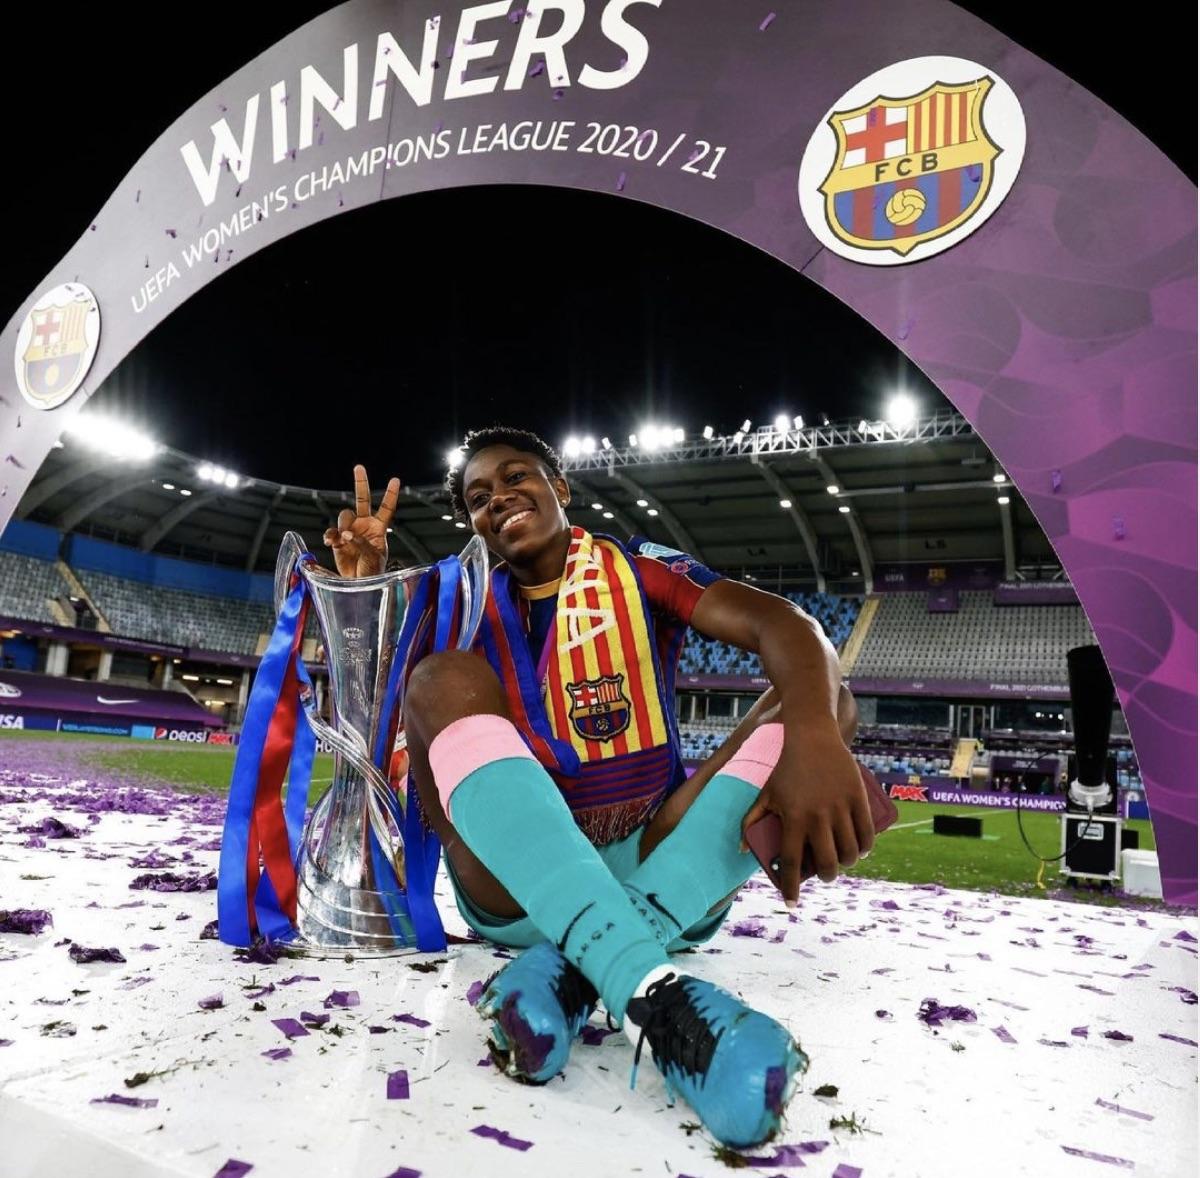 Asisat Oshoala makes history winning UEFA Women's Champions League with Barcelona Femeni